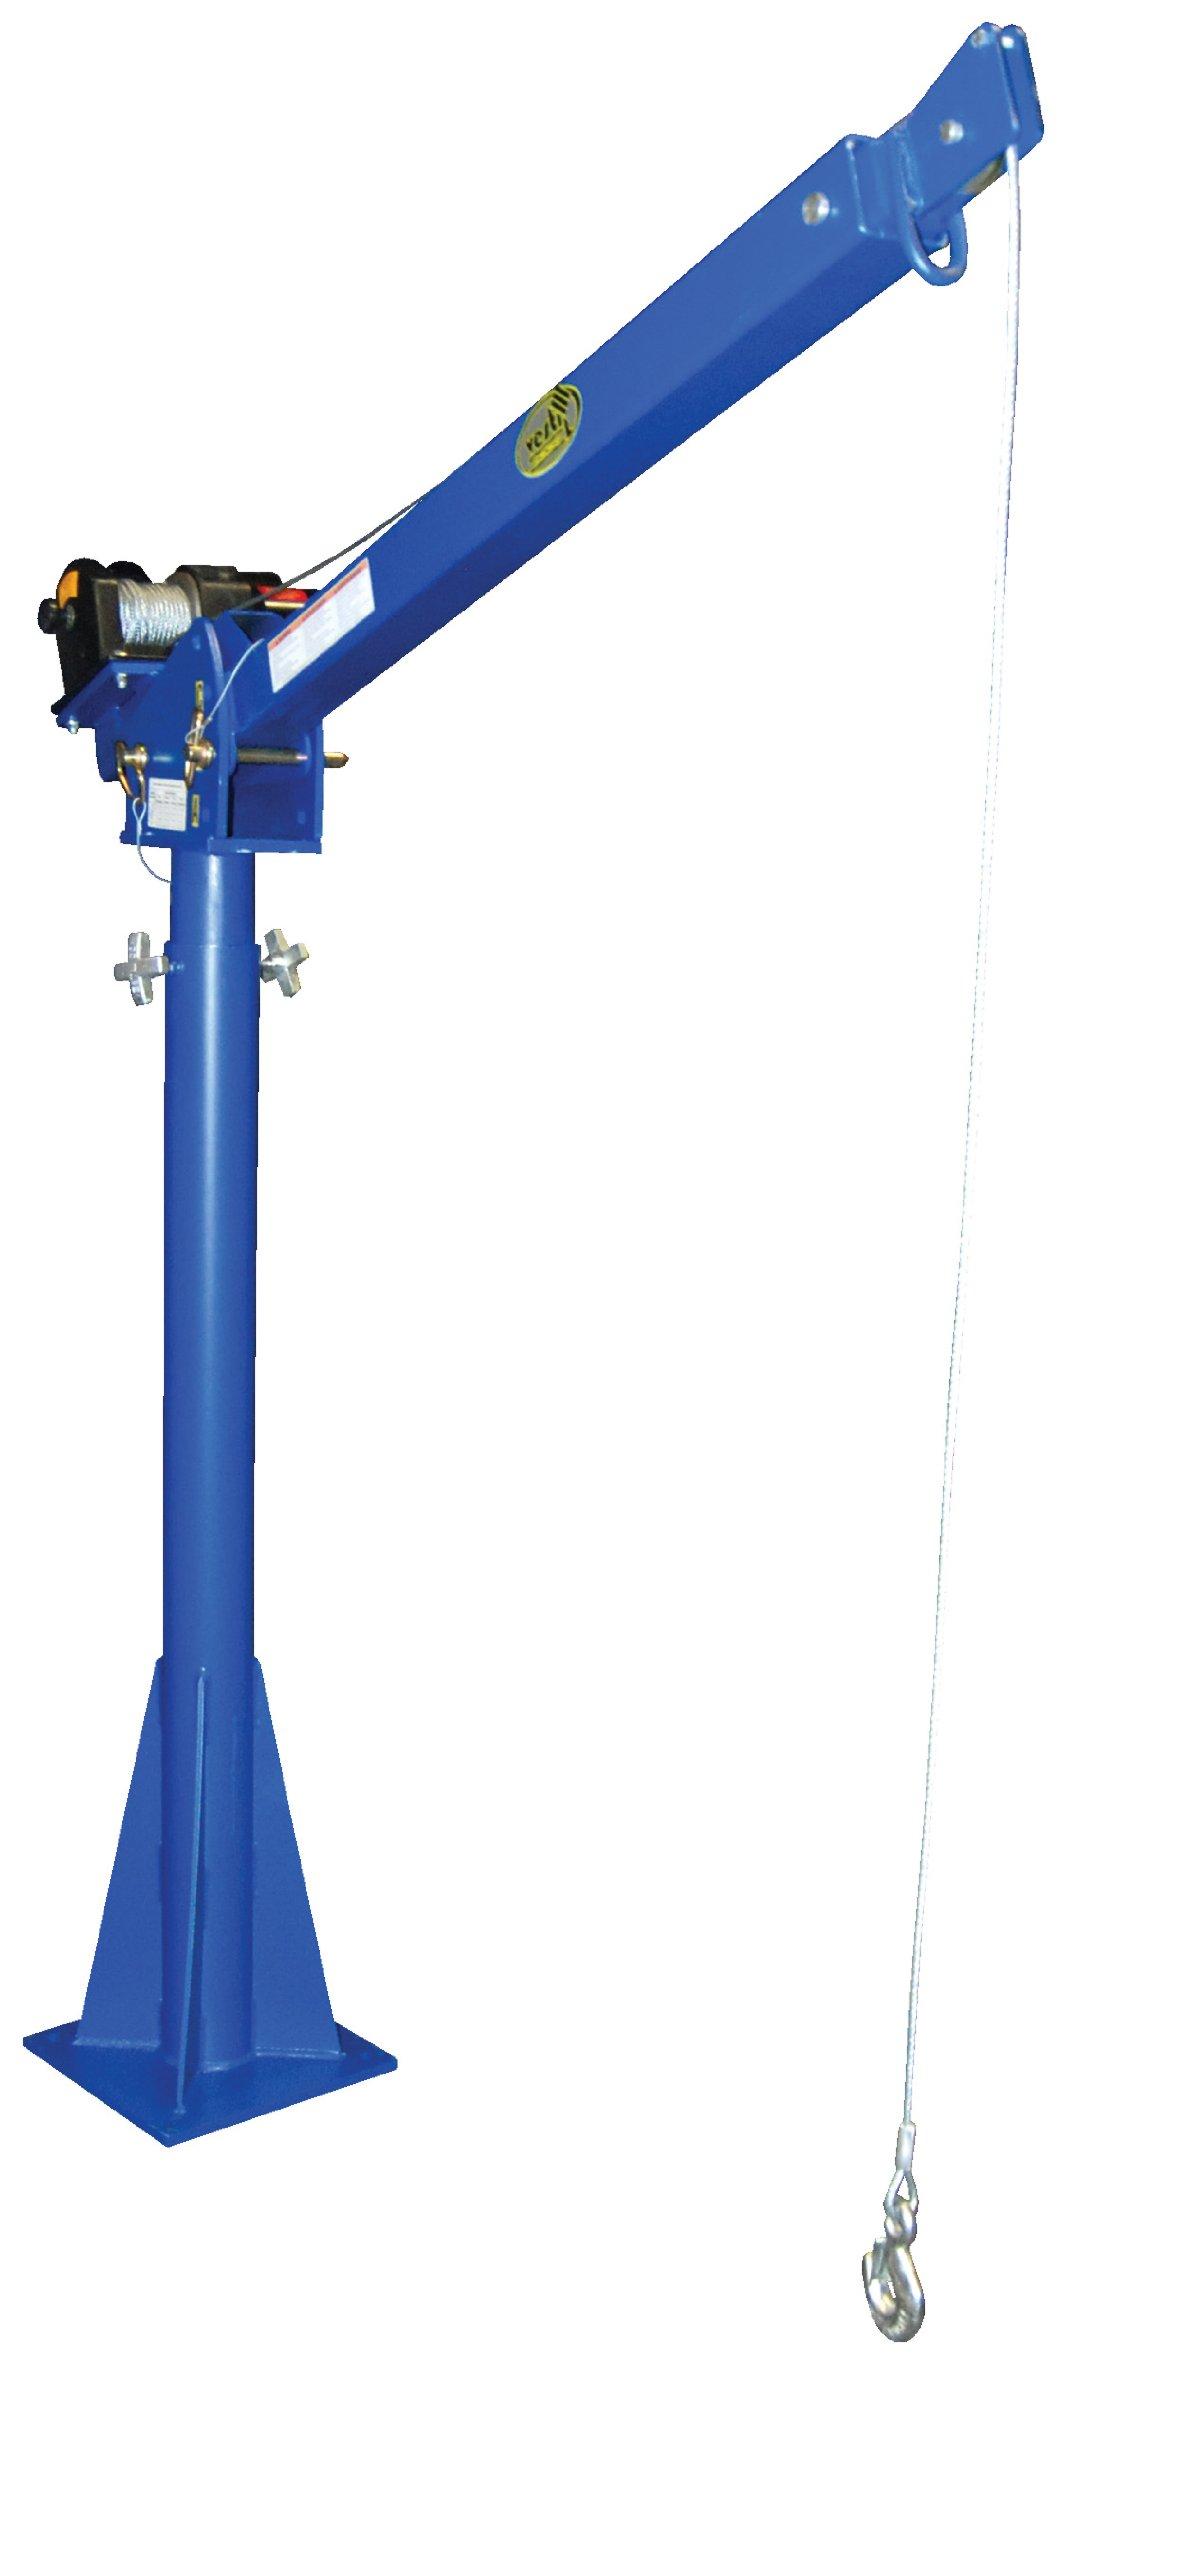 Vestil WTJ-20-4-DC 12V DC Power Lift Jib Crane, Steel, 2000 lb. Capacity, 46' Cable Length, 68-13/16'' Height